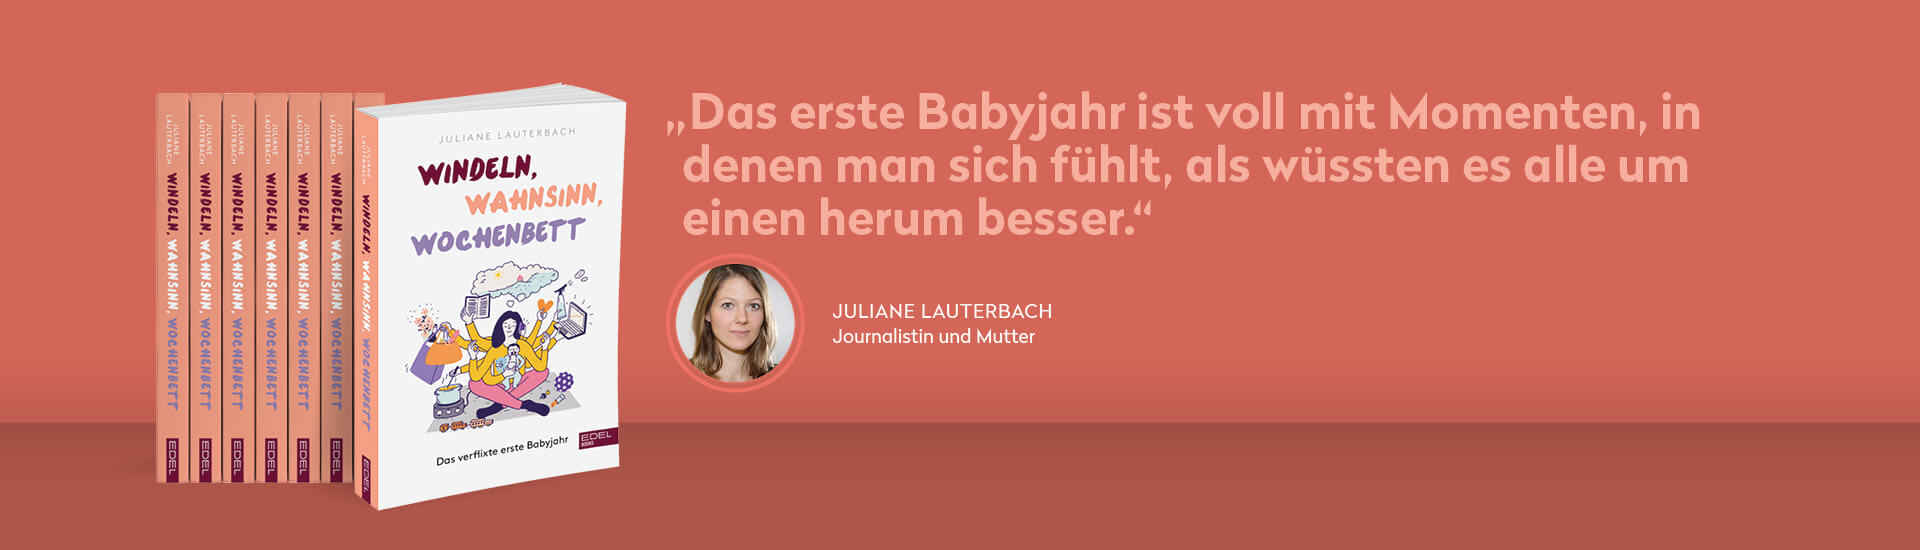 200807_JulianeLauterbach_WindelnWahnsinnWochenbett_Webbanner_Q2Q32020_lj